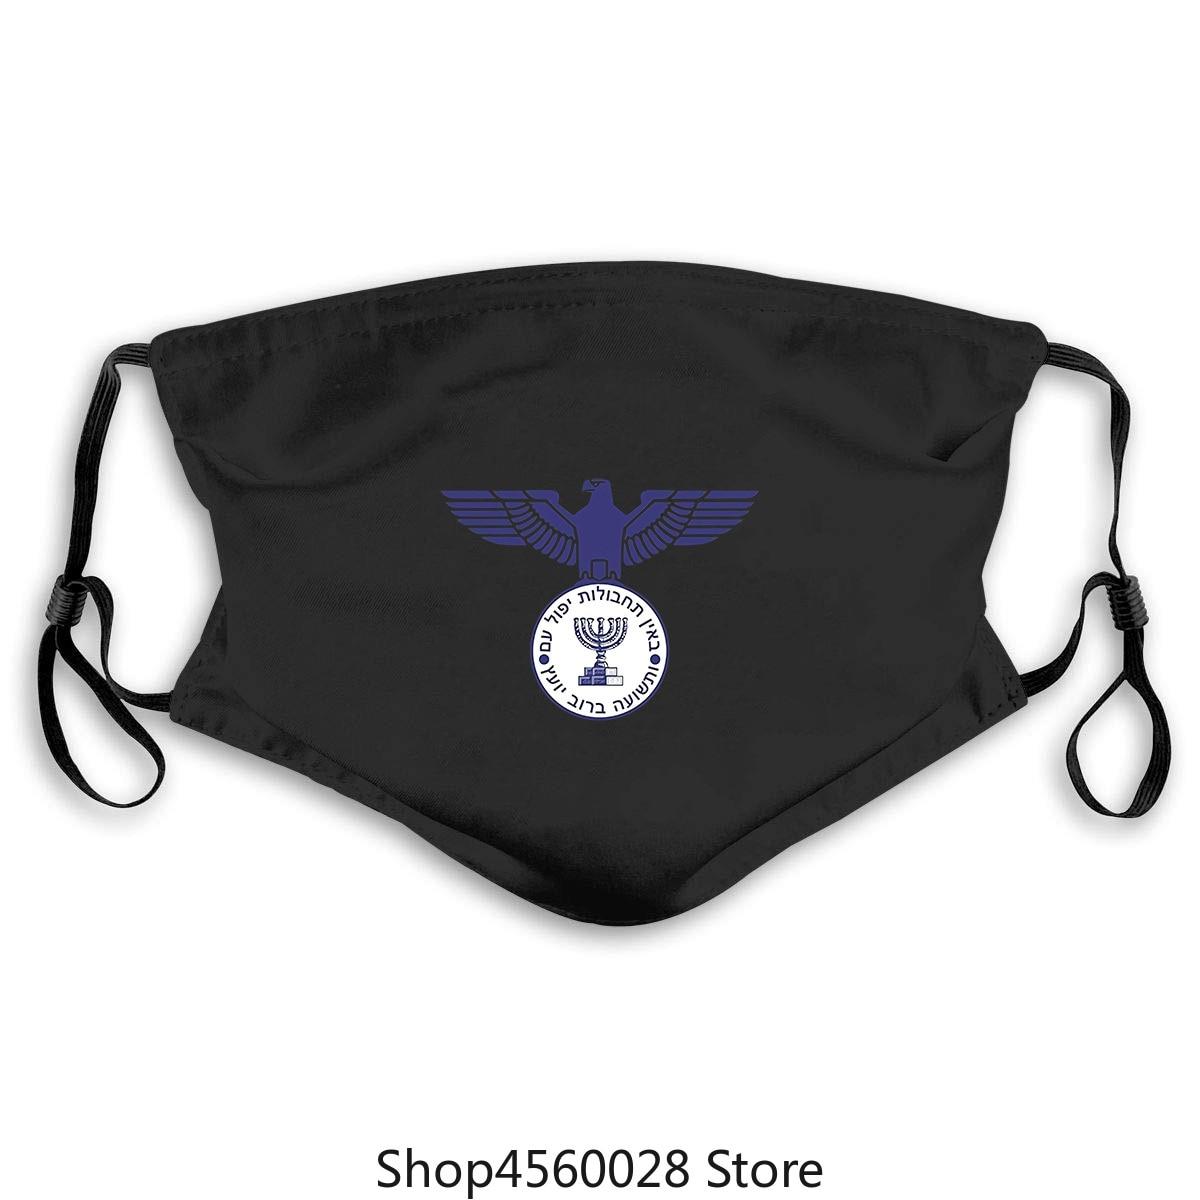 2020 Vendita Moda Mossad Eagle Israele Servizio Segreto Maschera IDF In Maschera Da Uomo Abbigliamento 2020 Alta Qualità Mascher